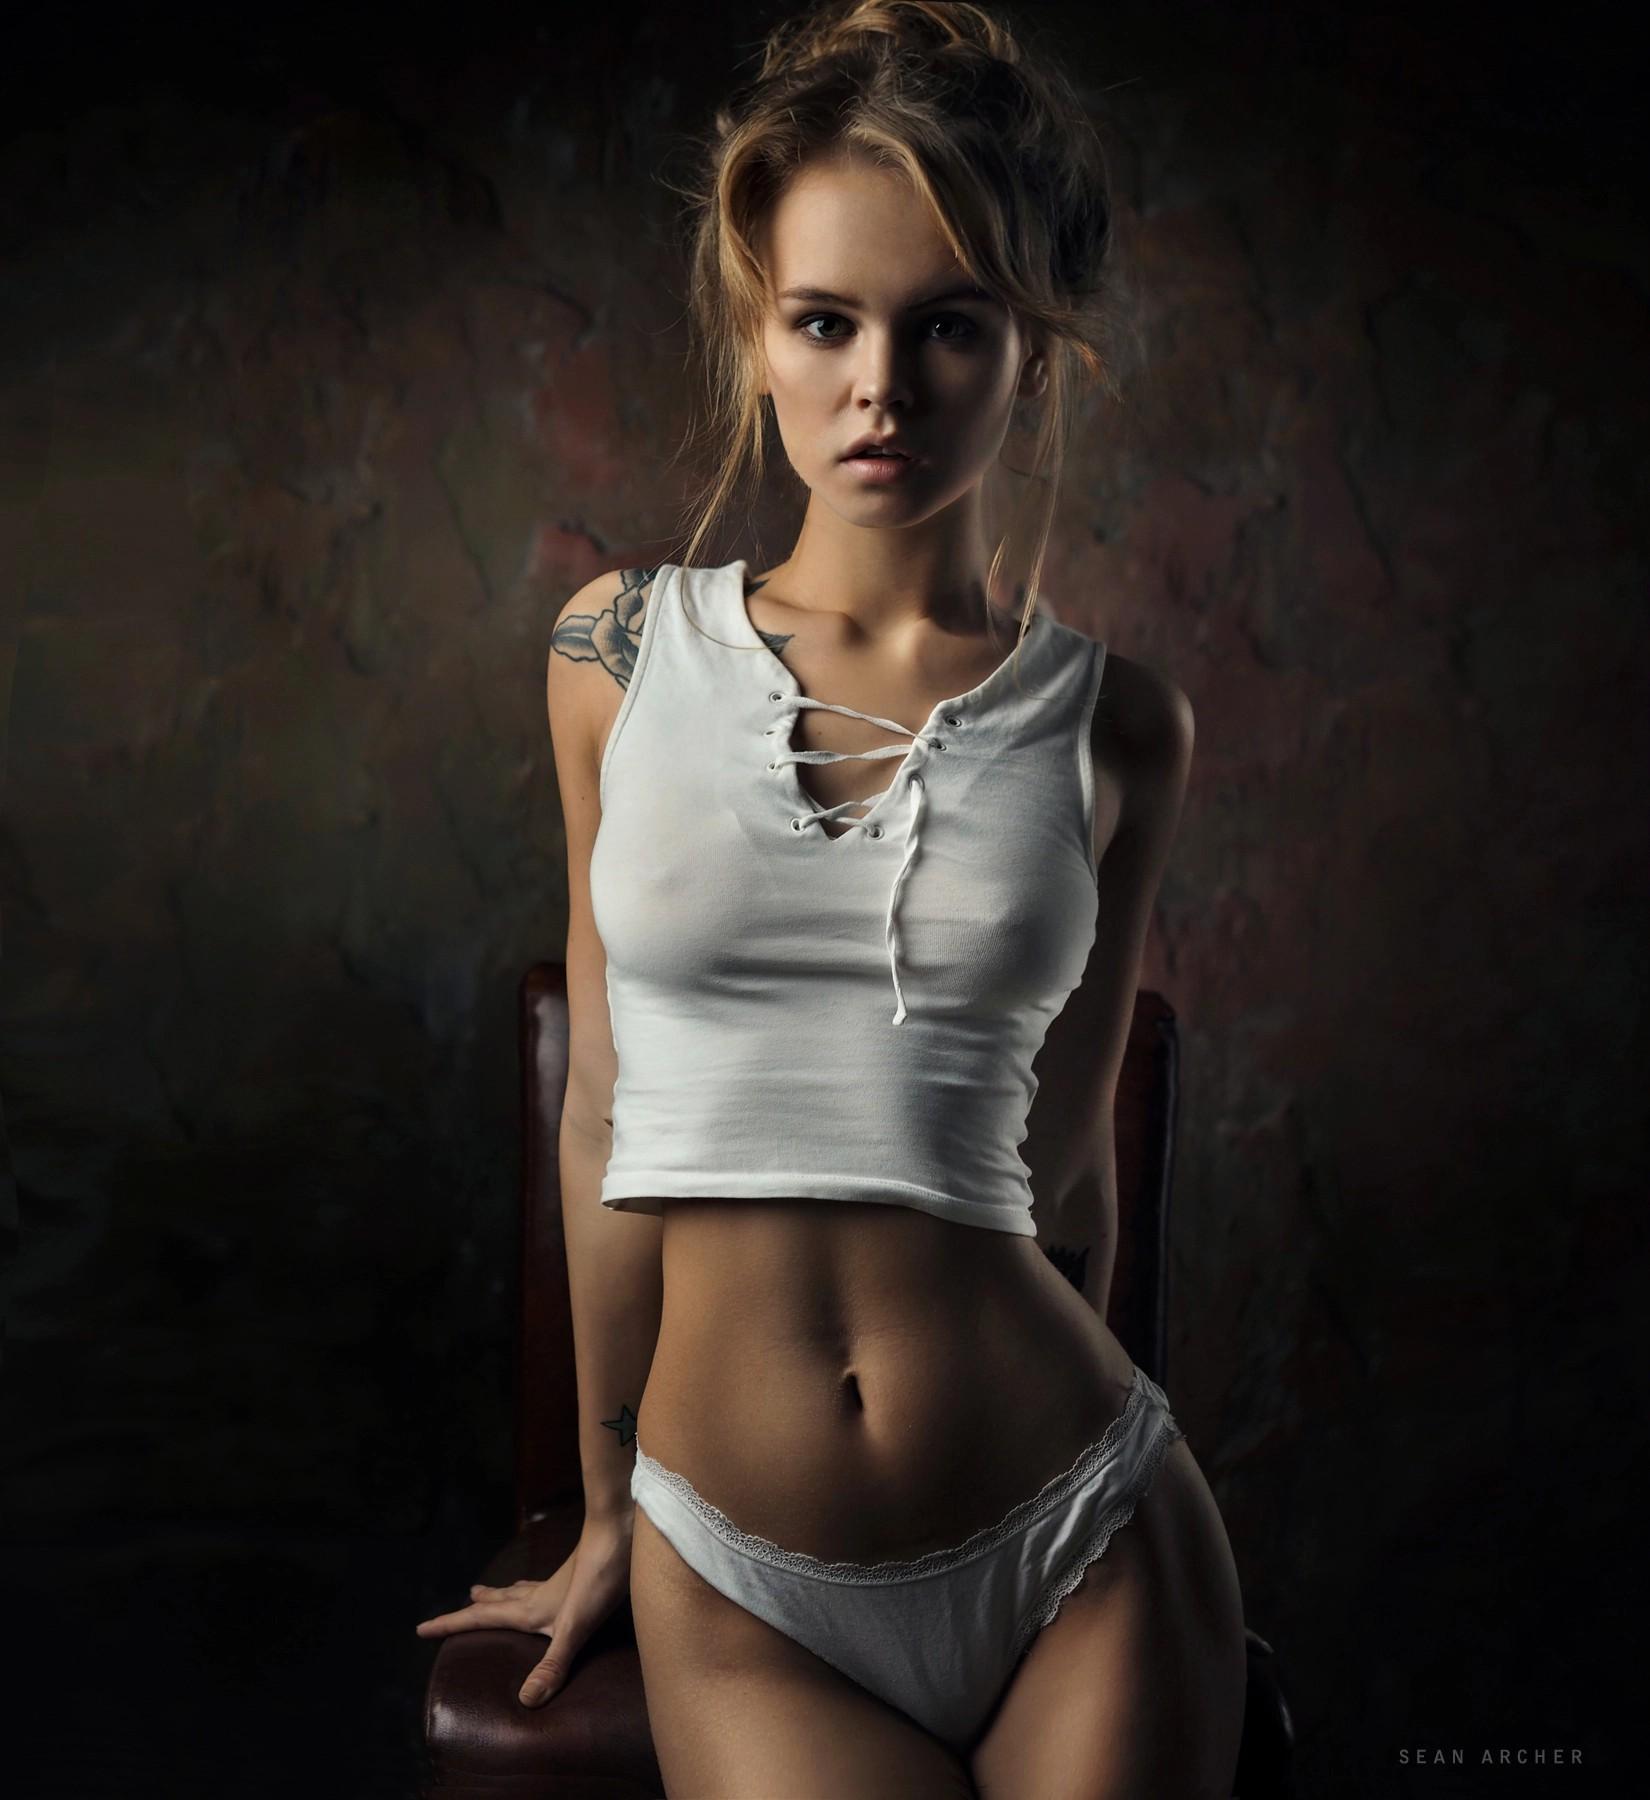 Nipples Through Clothing